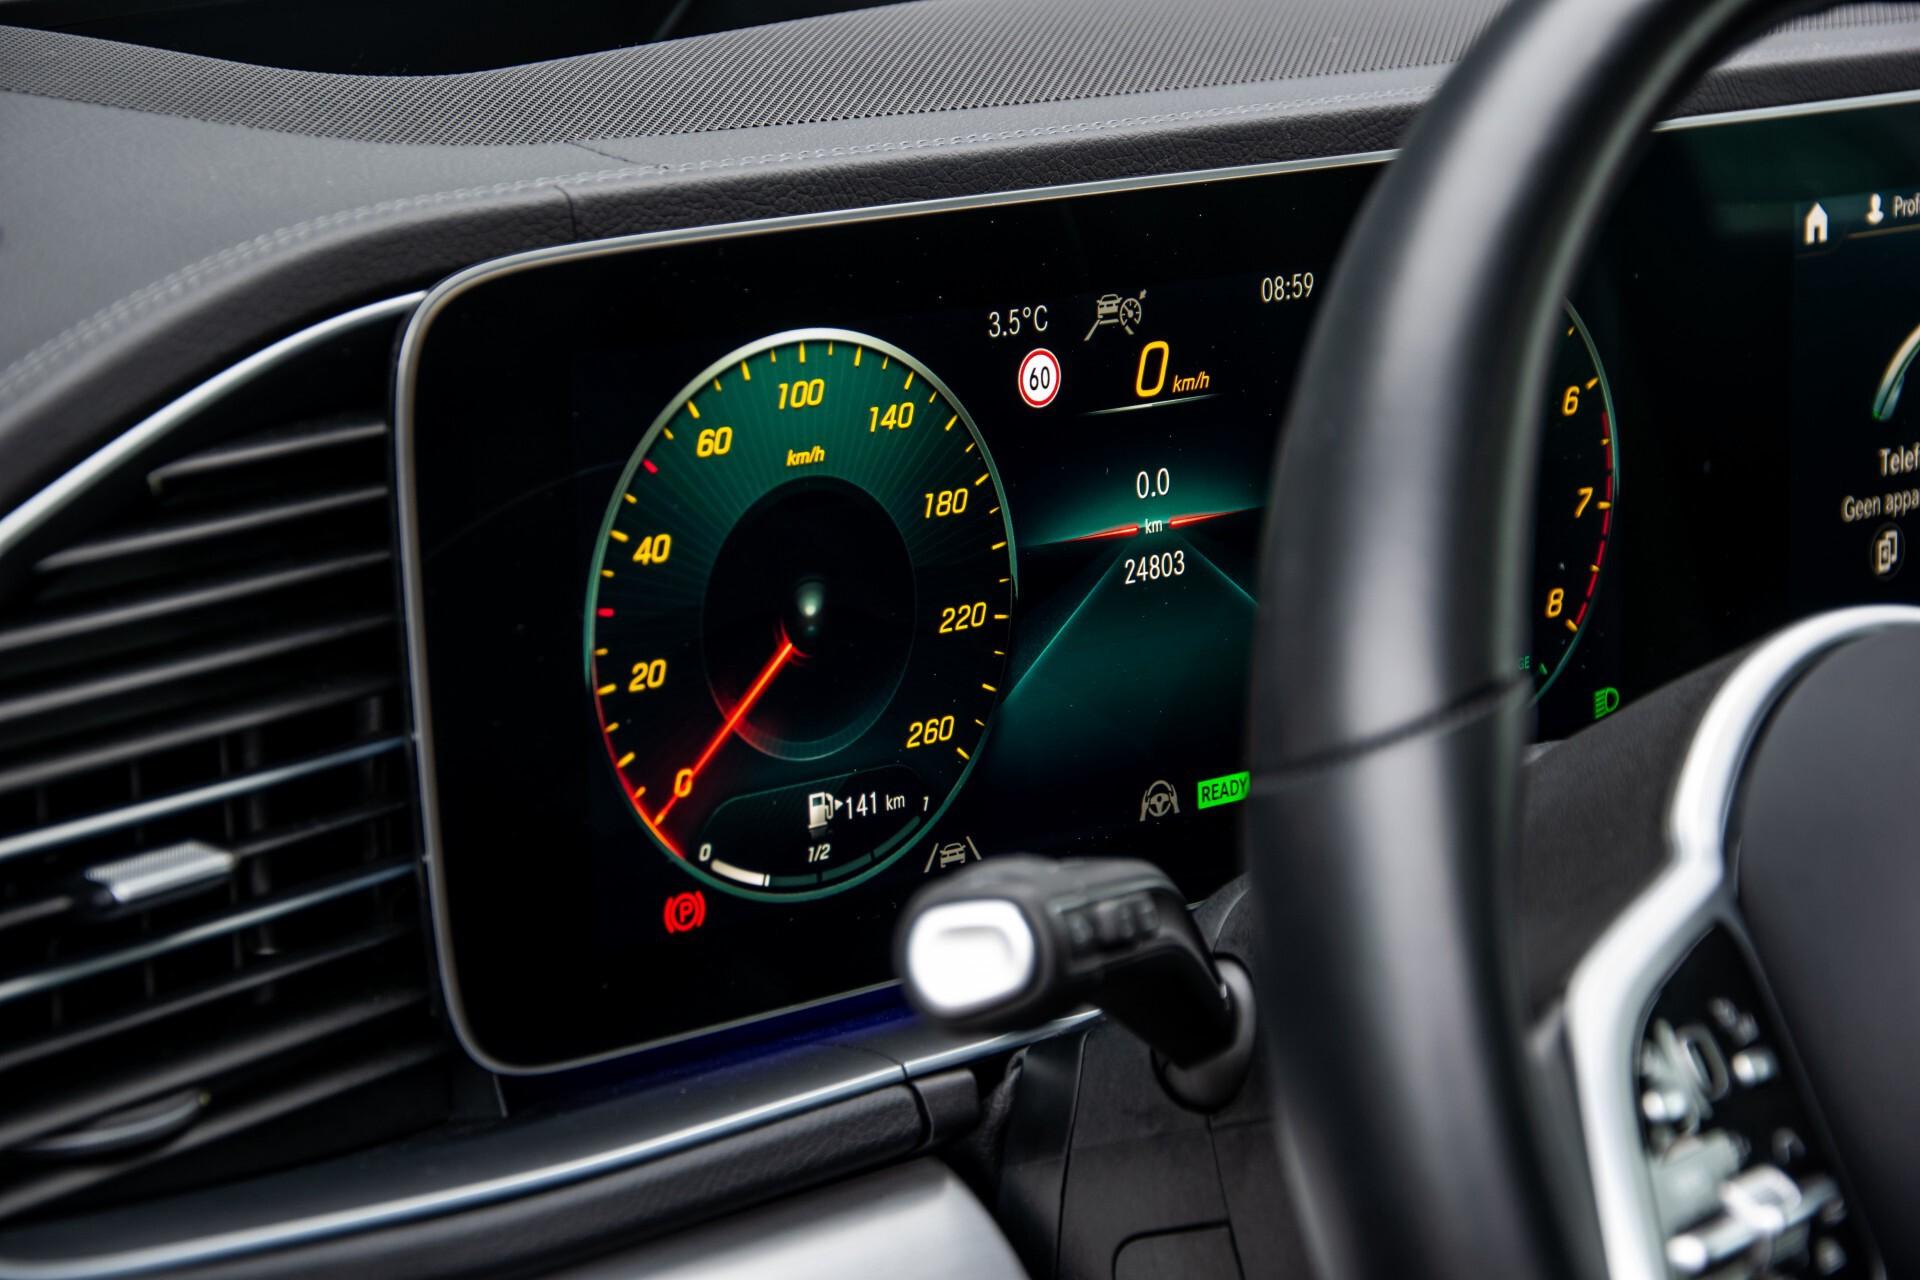 Mercedes-Benz GLE 450 4-M 7-Persoons AMG Massage/Rij-assist/Keyless/TV/360/Night/Trekhaak Aut9 Foto 25